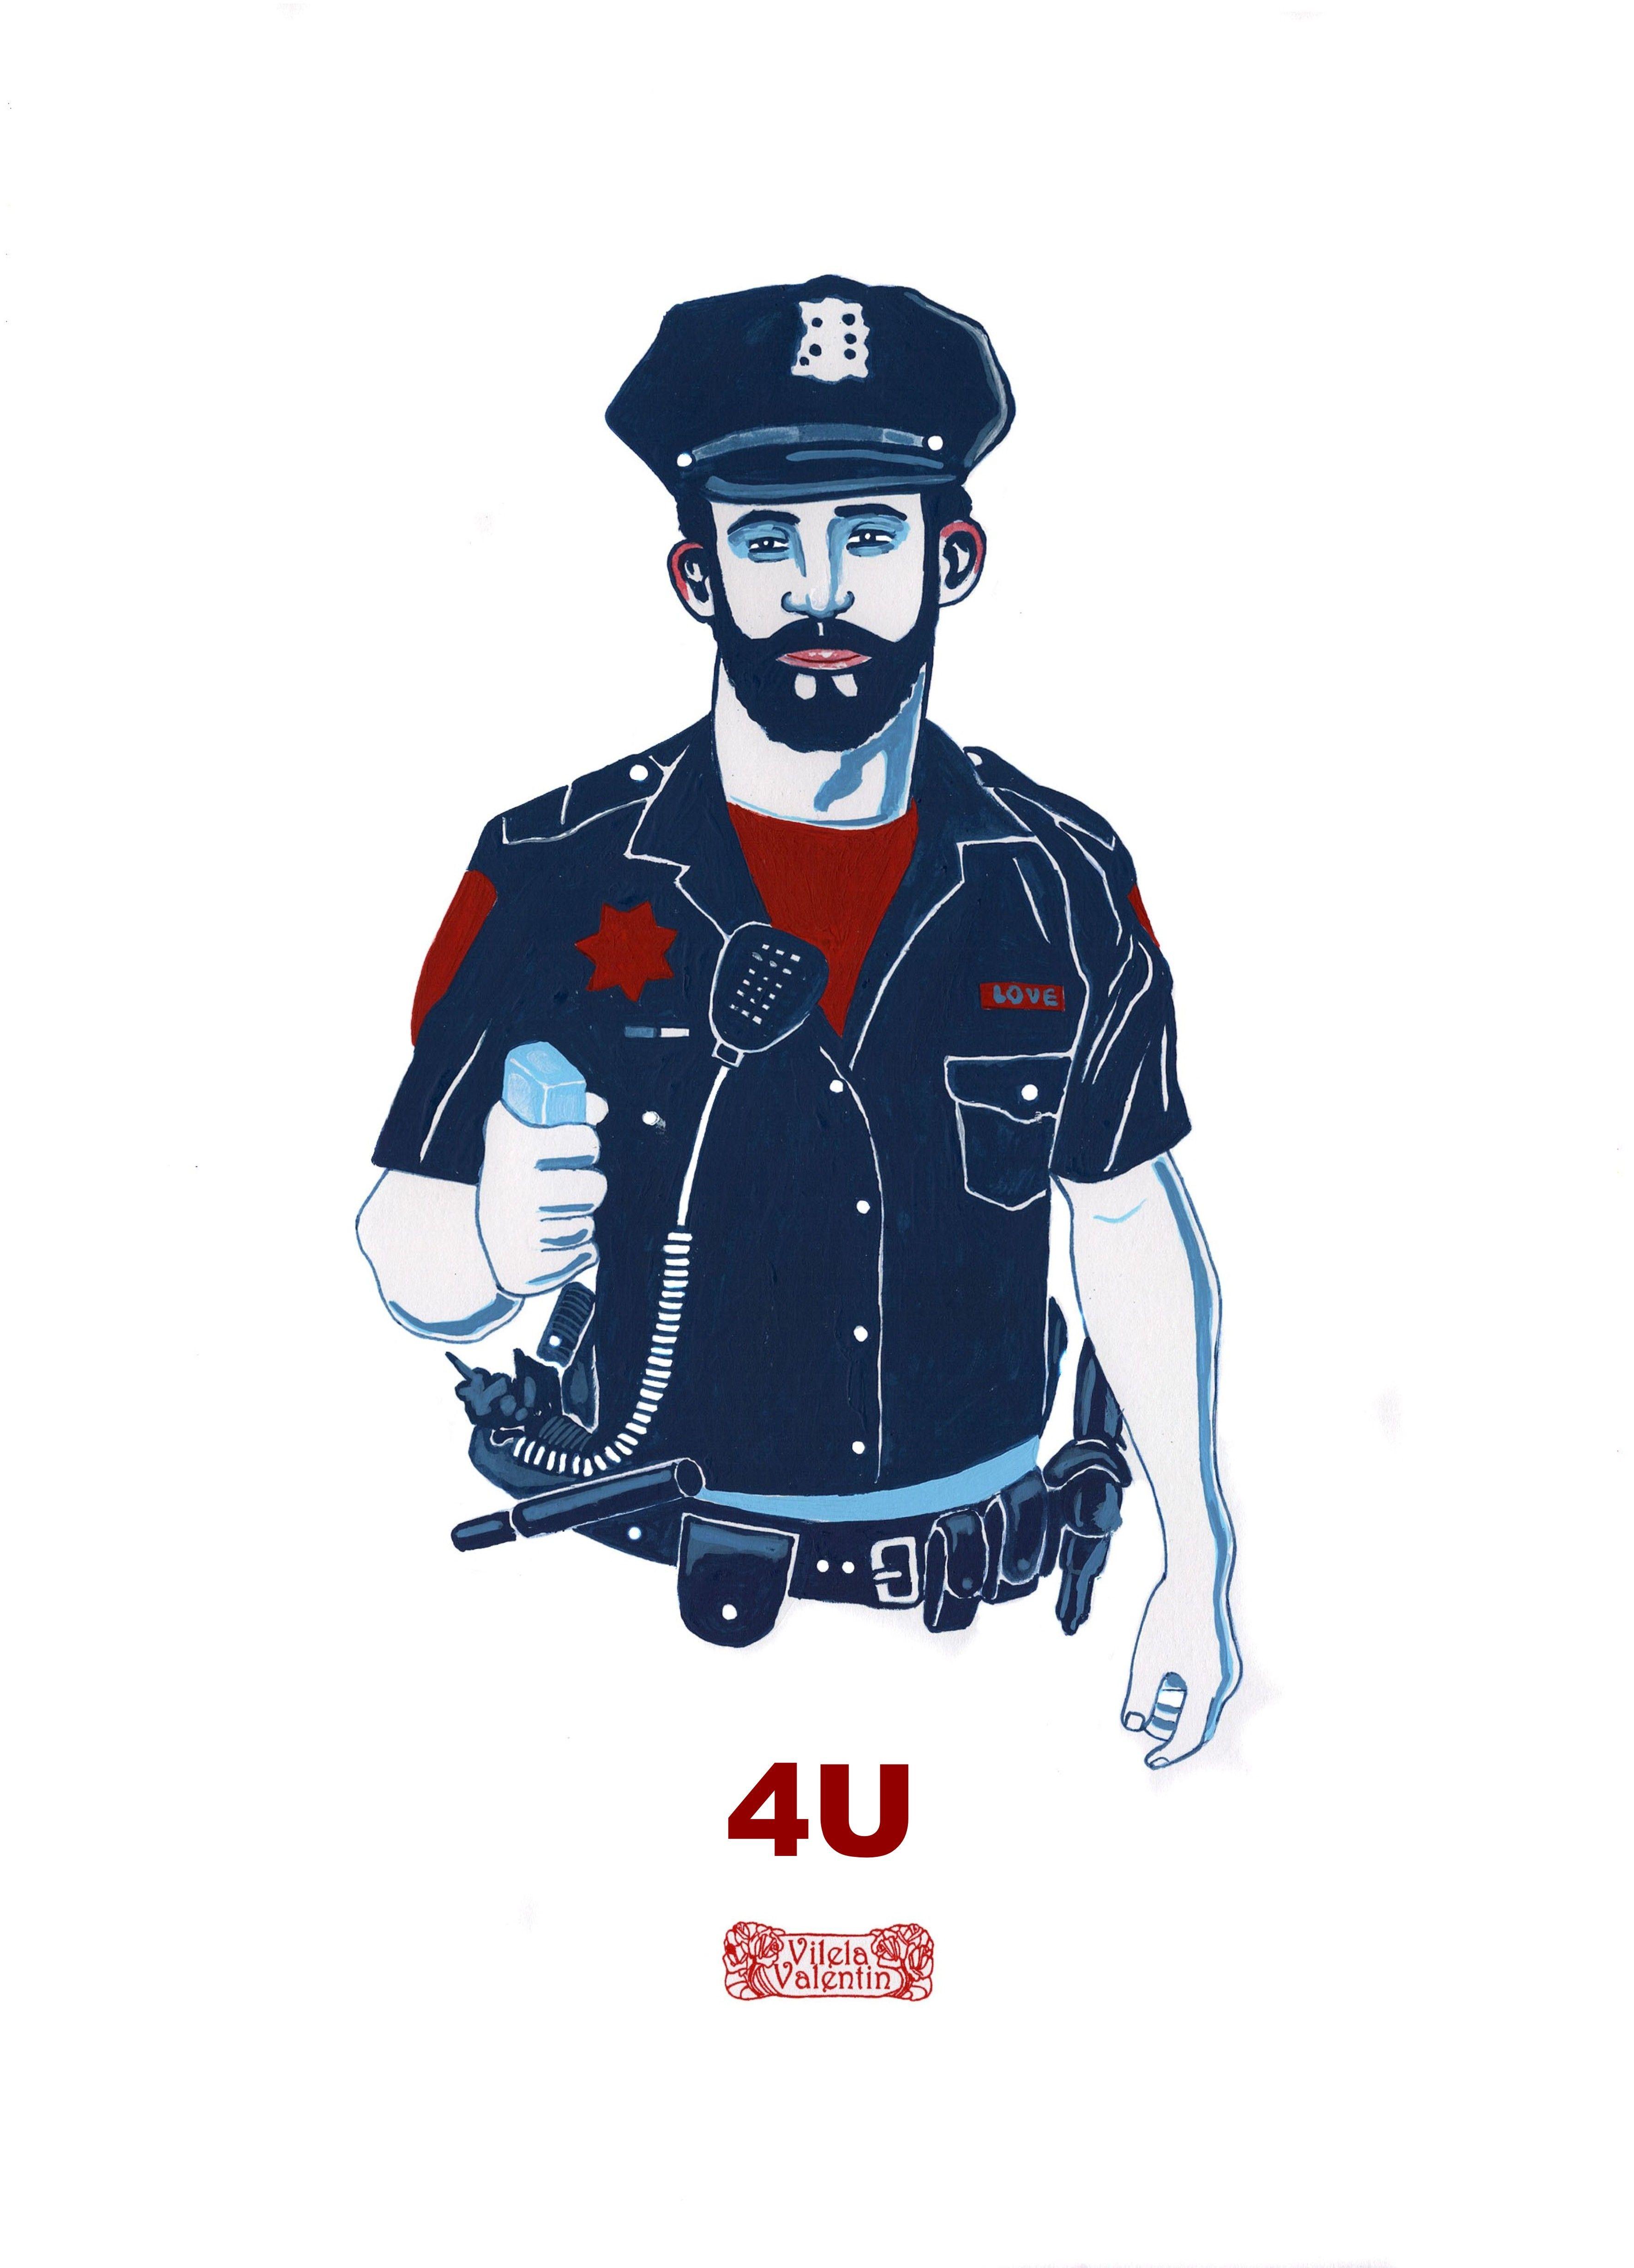 4U - Acrylic on paper  42,0cm de altura x 29,7cm - Vilela Valentin